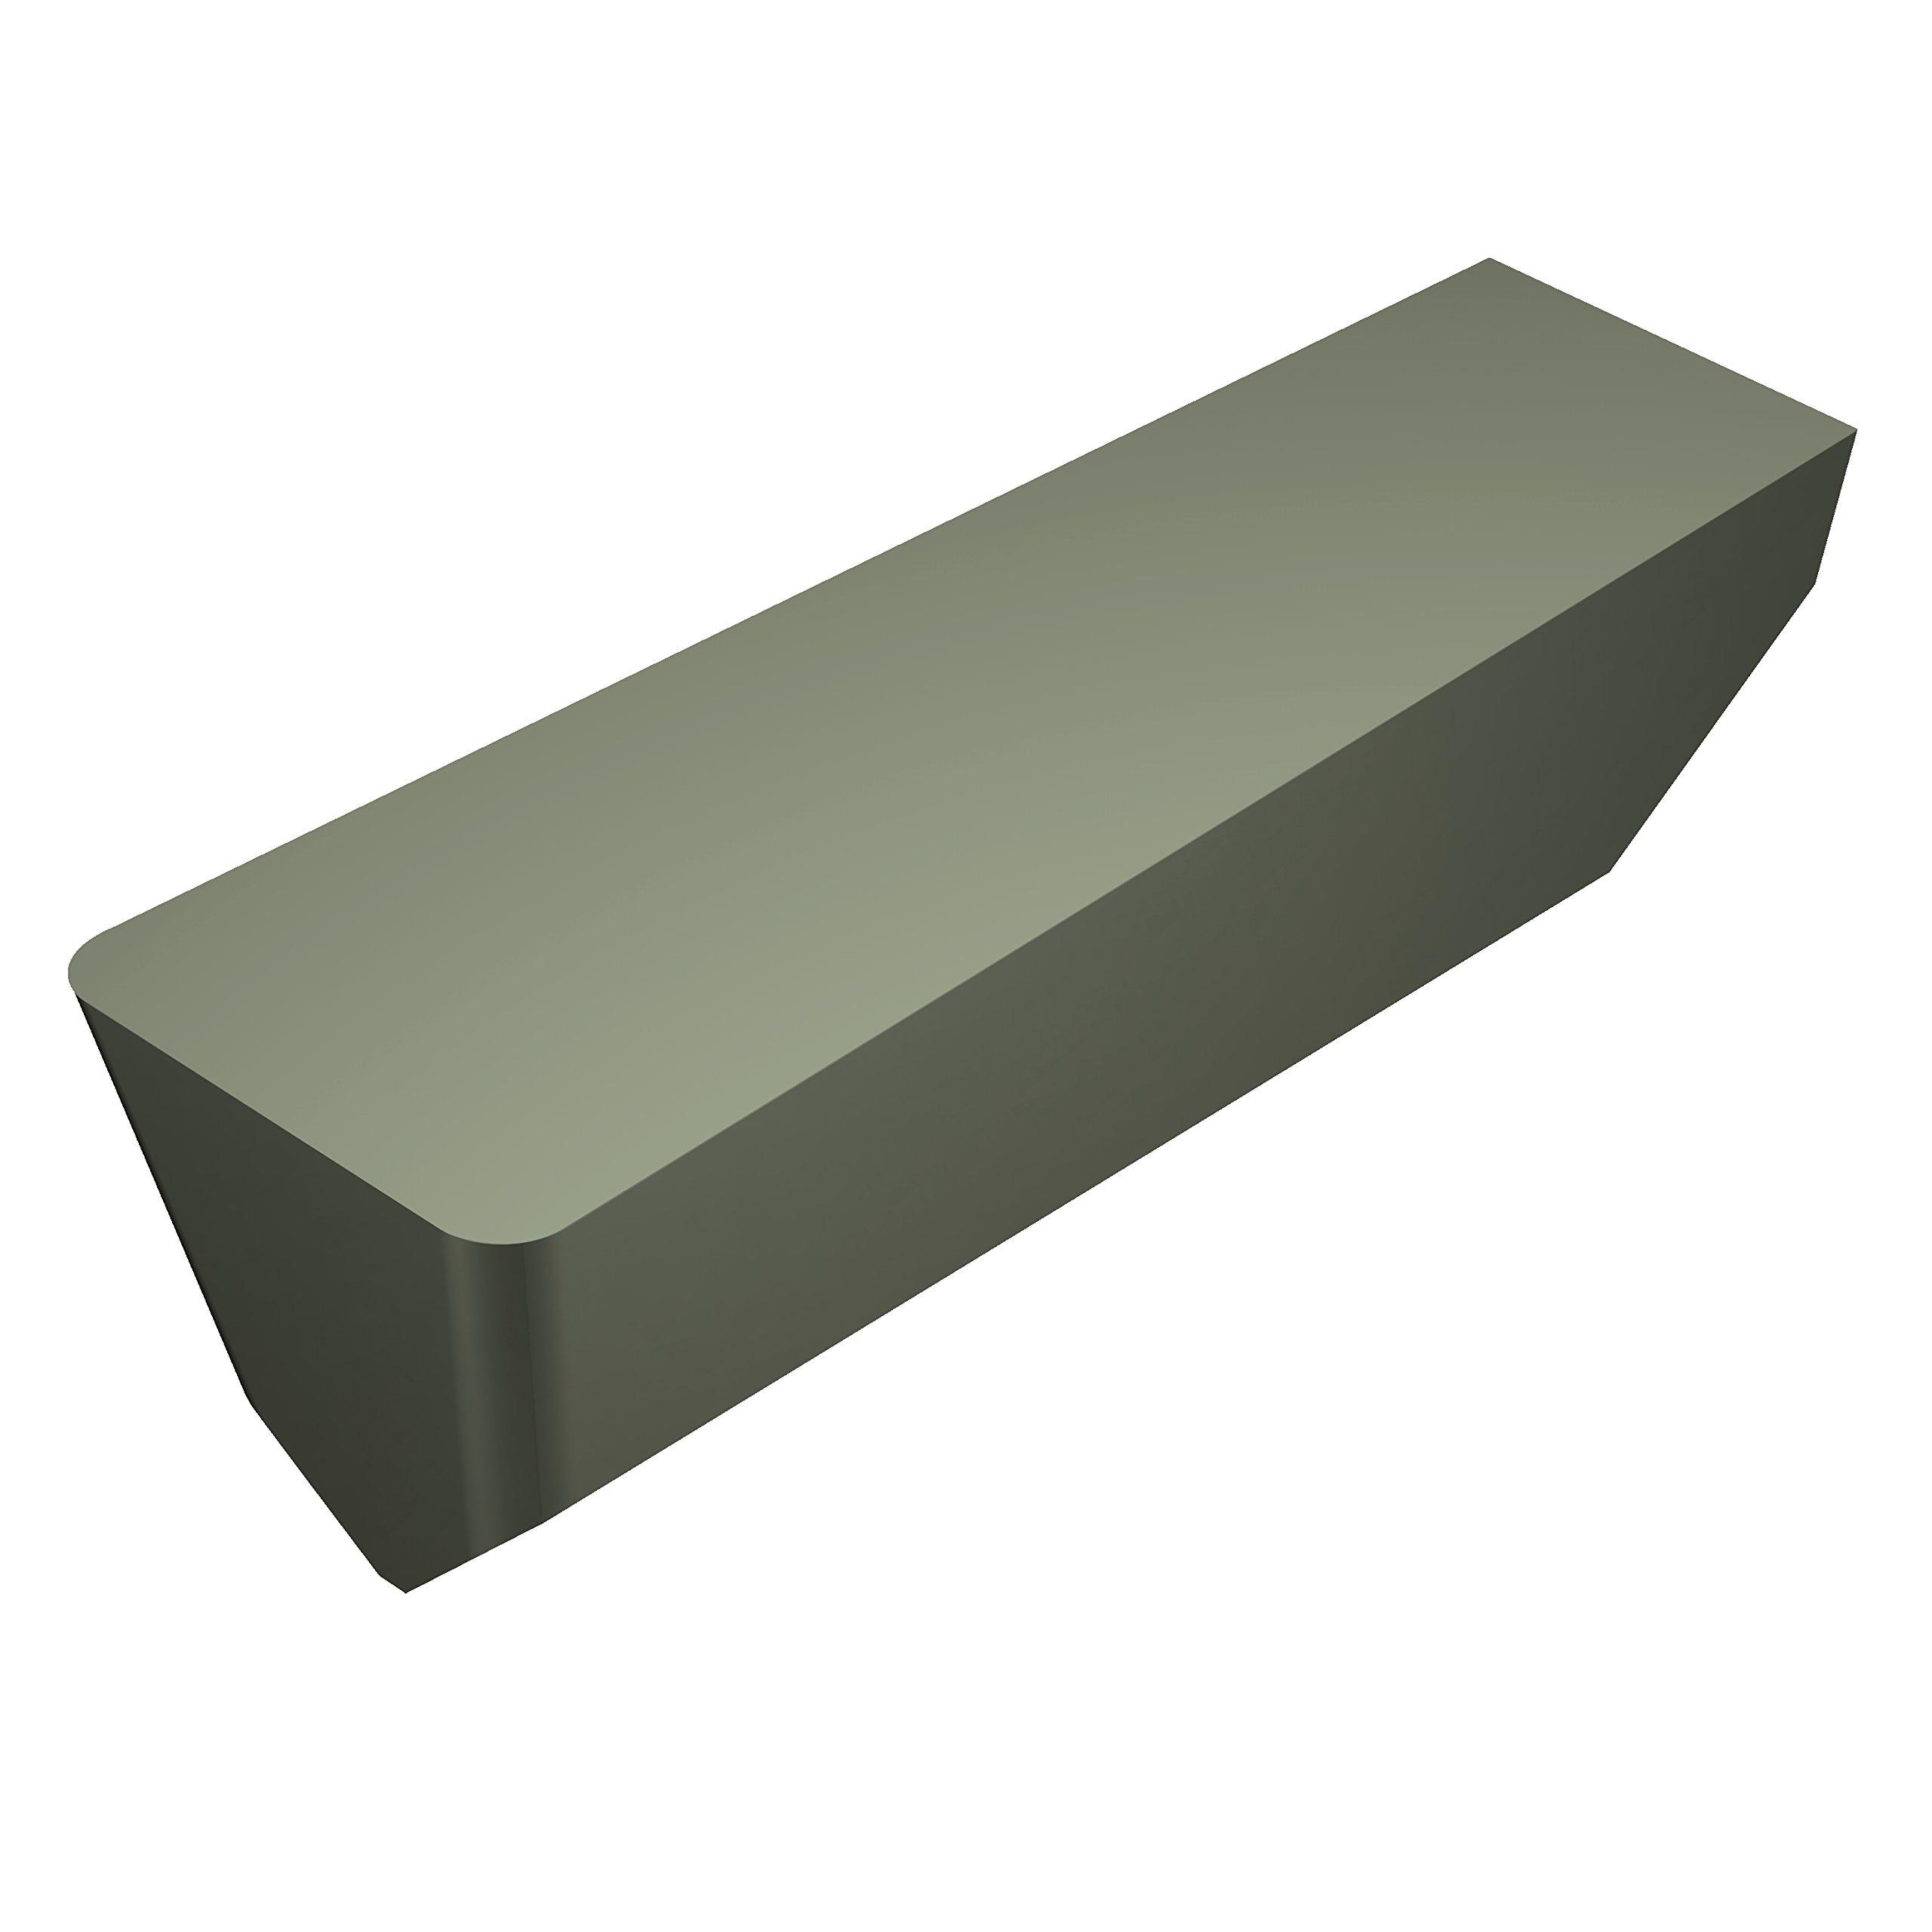 Sandvik Coromant T-Max Ceramic Grooving Insert, T Geometry, CC670 Grade, Uncoated, 1 Cutting Edge, CSG-4125-1T0320, Neutral Cut, 0.125'' Cutting Width, 0.015'' Corner Radius, 1 Insert Seat Size (Pack of 10)